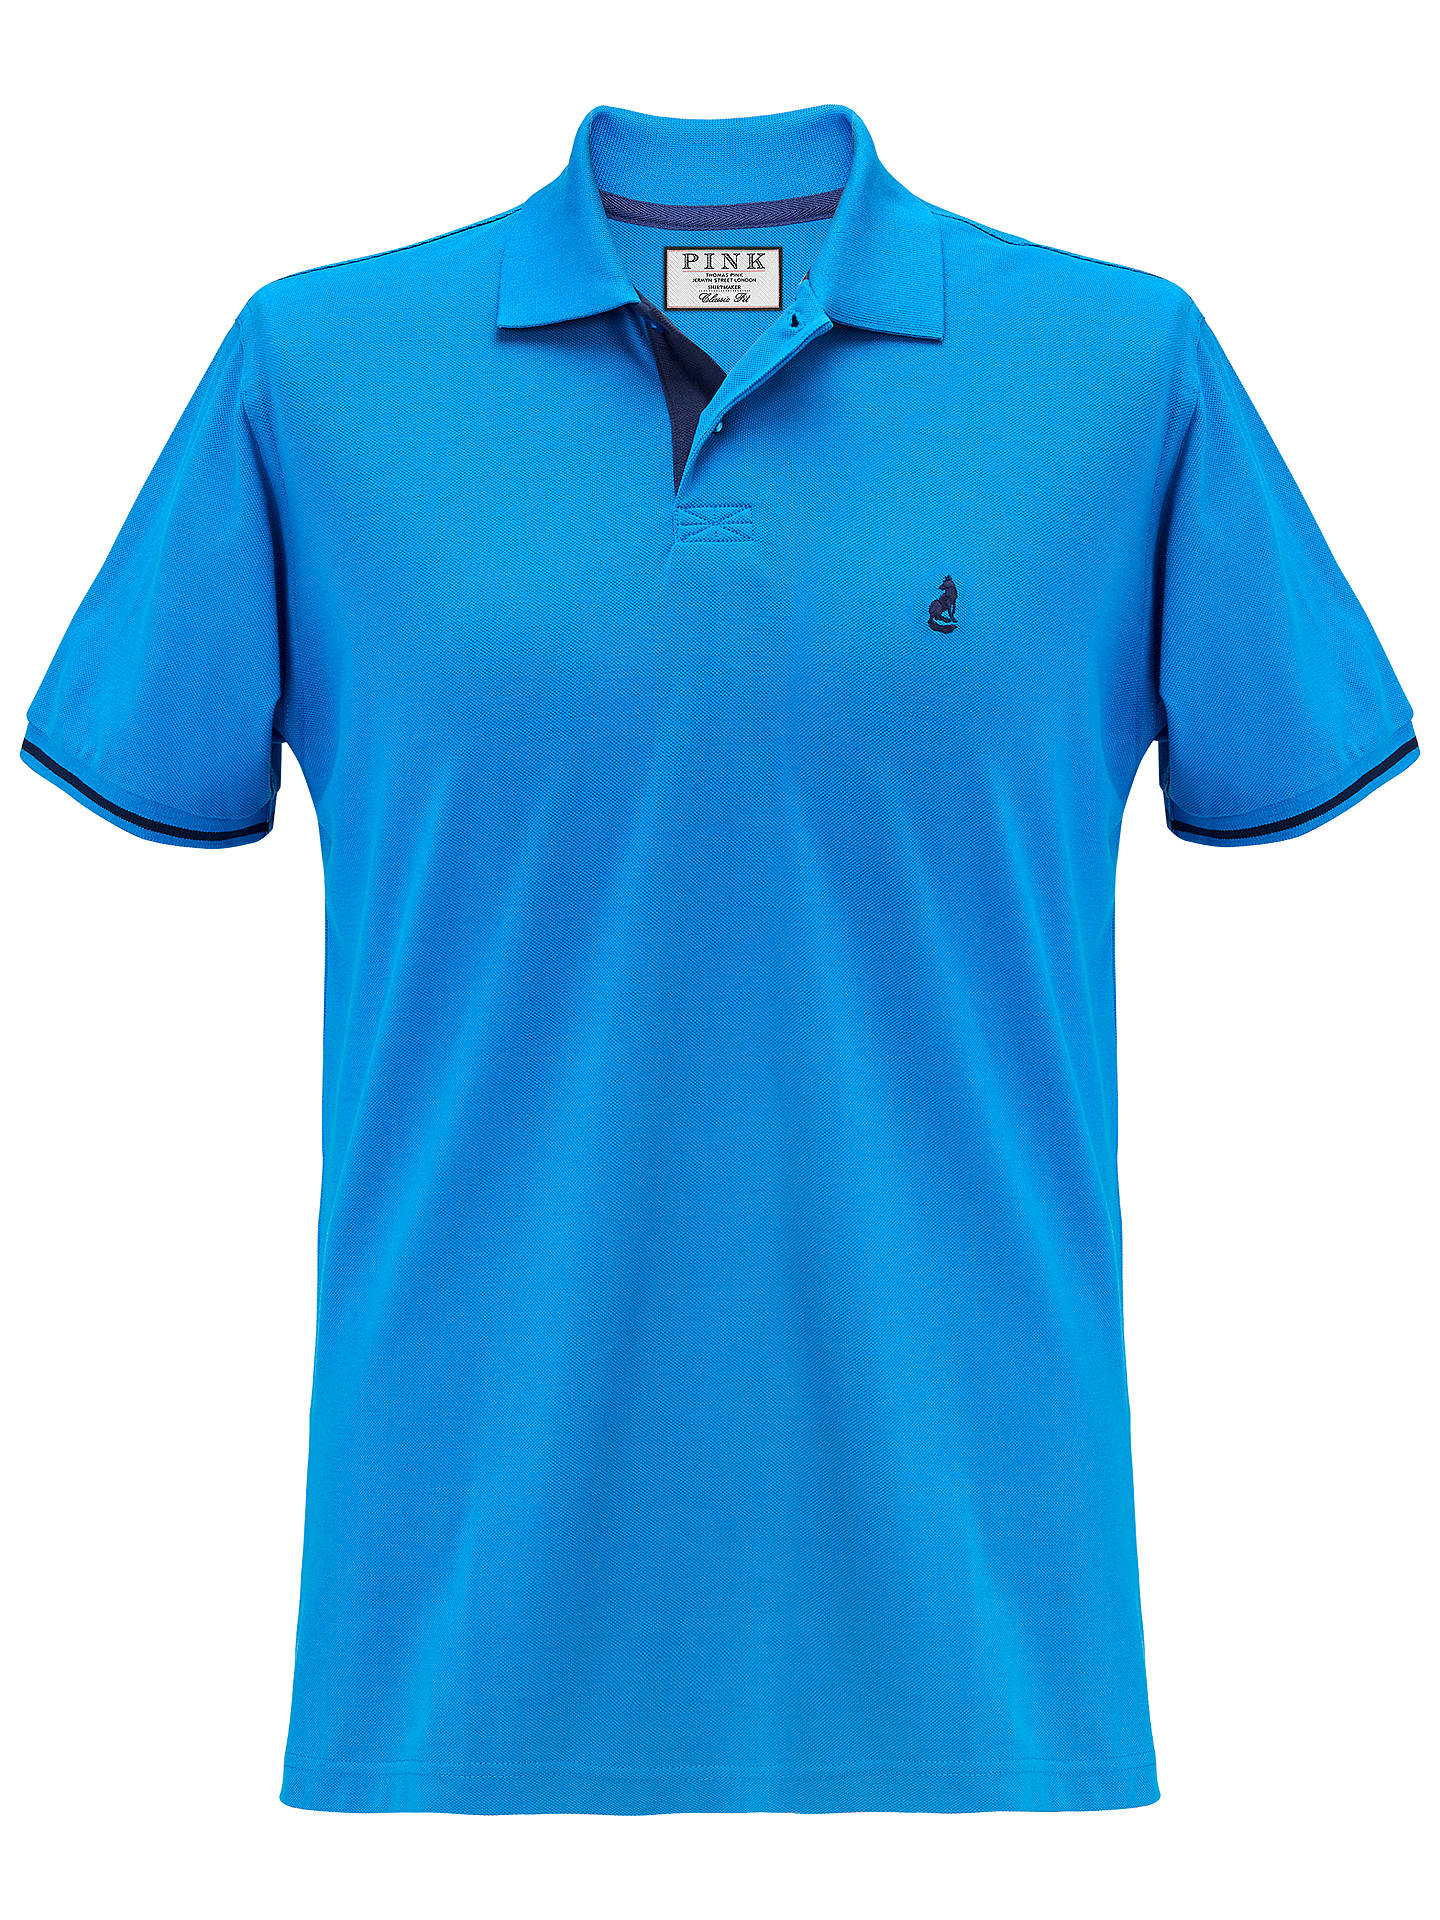 b5d2a52d208 Buy Thomas Pink Brandon Polo Shirt, Blue/Navy, S Online at johnlewis.